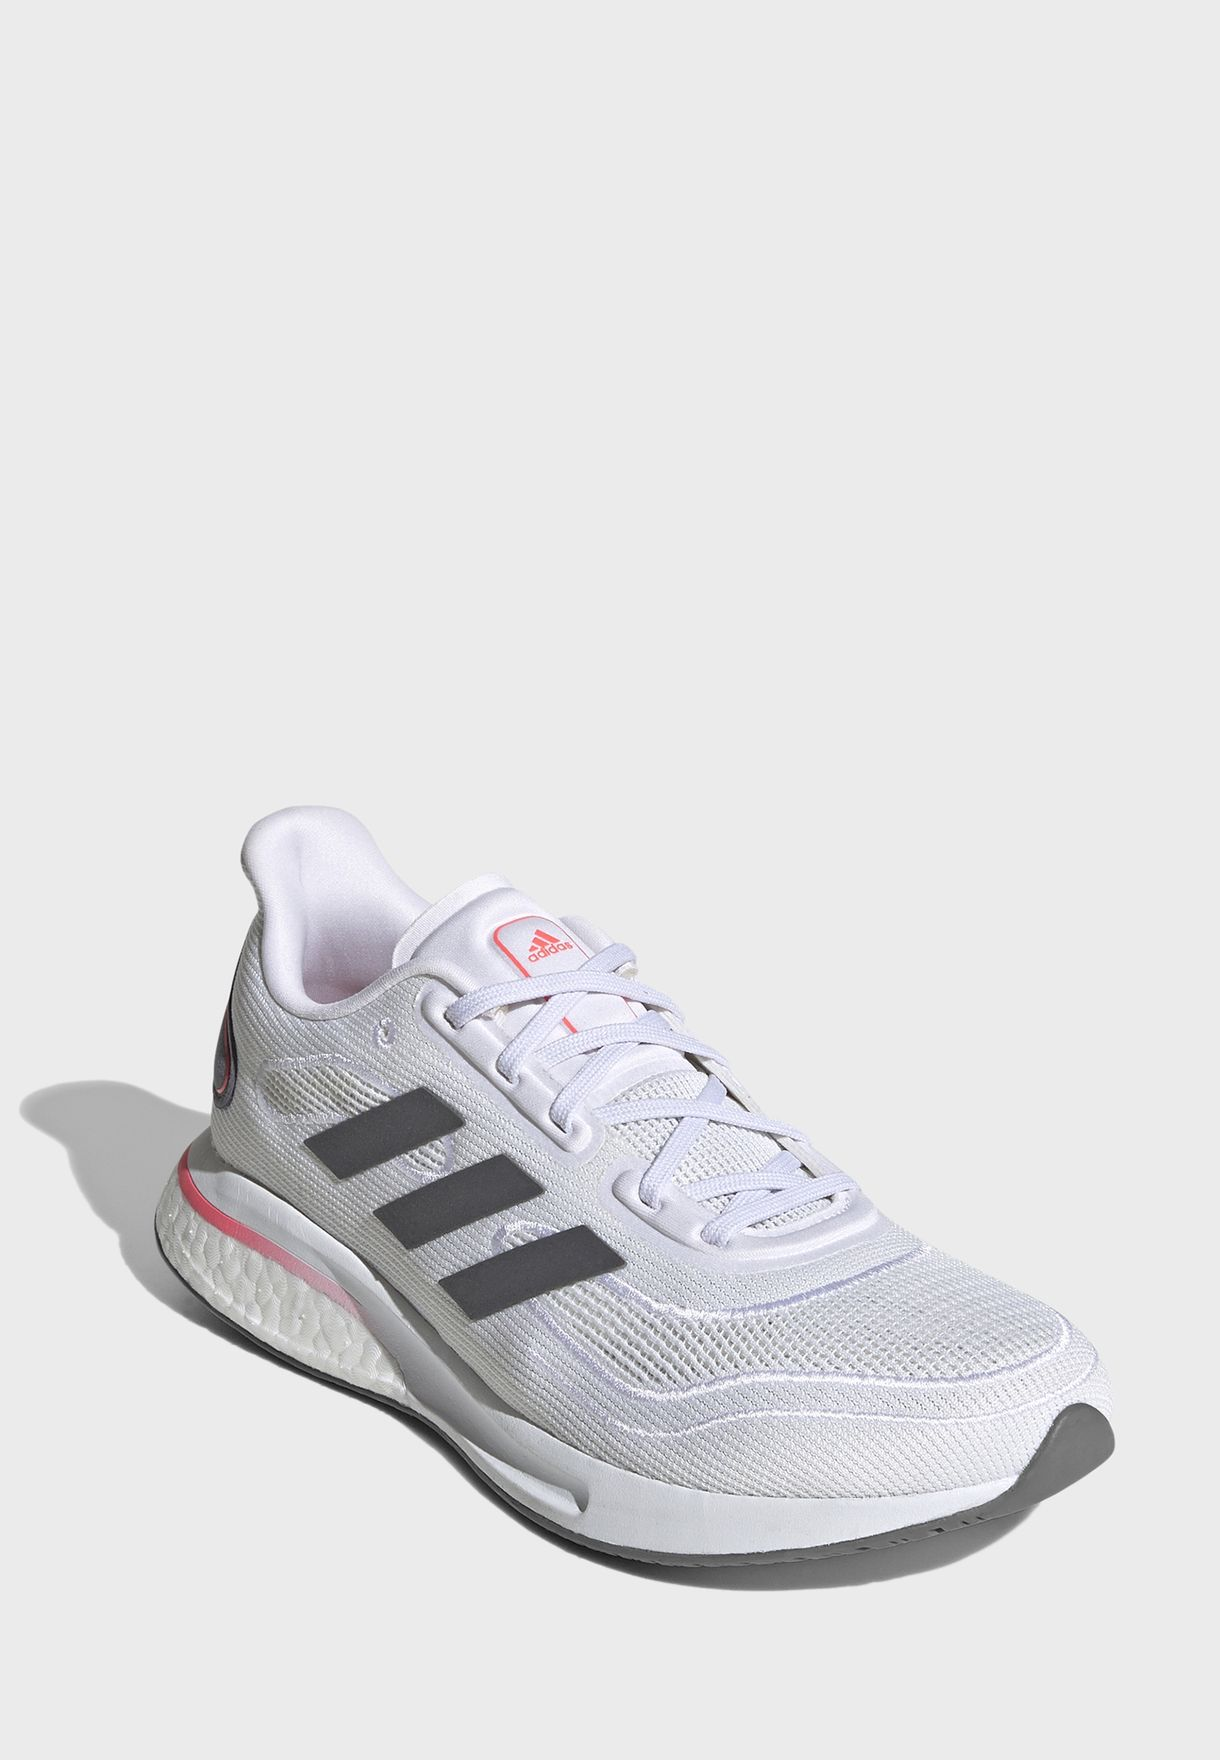 Solar Boost Supernova Women's Sports Running Shoes